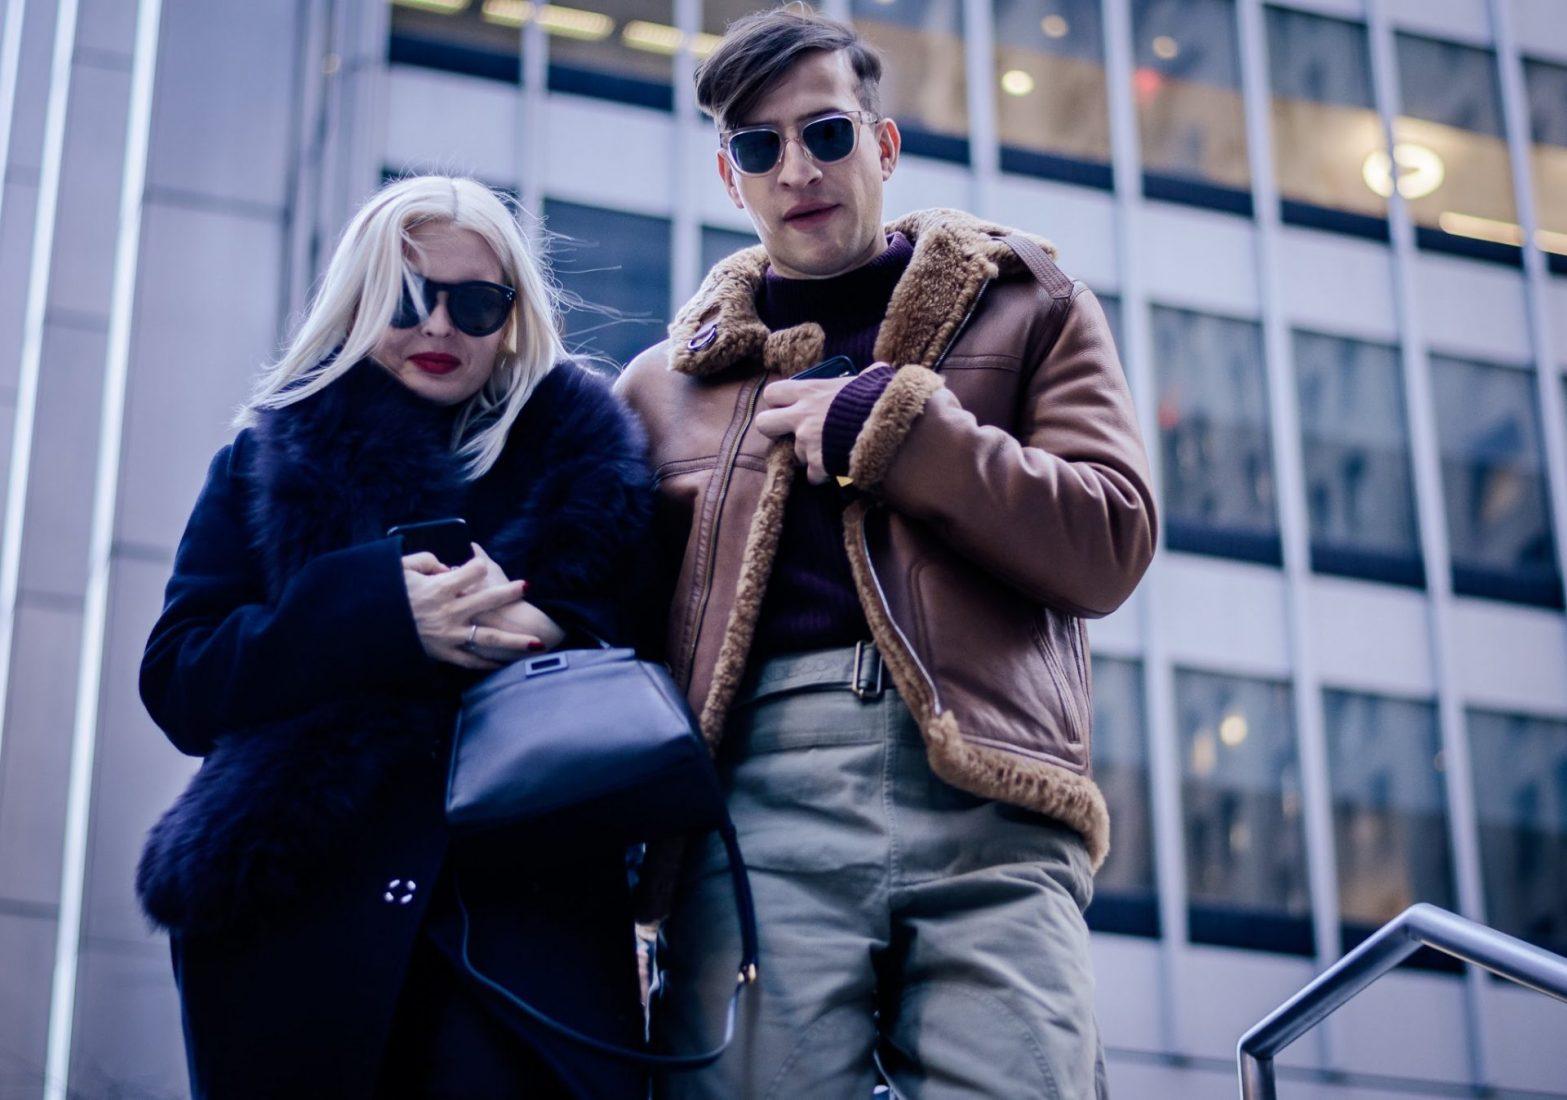 New York Fashion Week Fall/Winter 2019 Wrap-Up